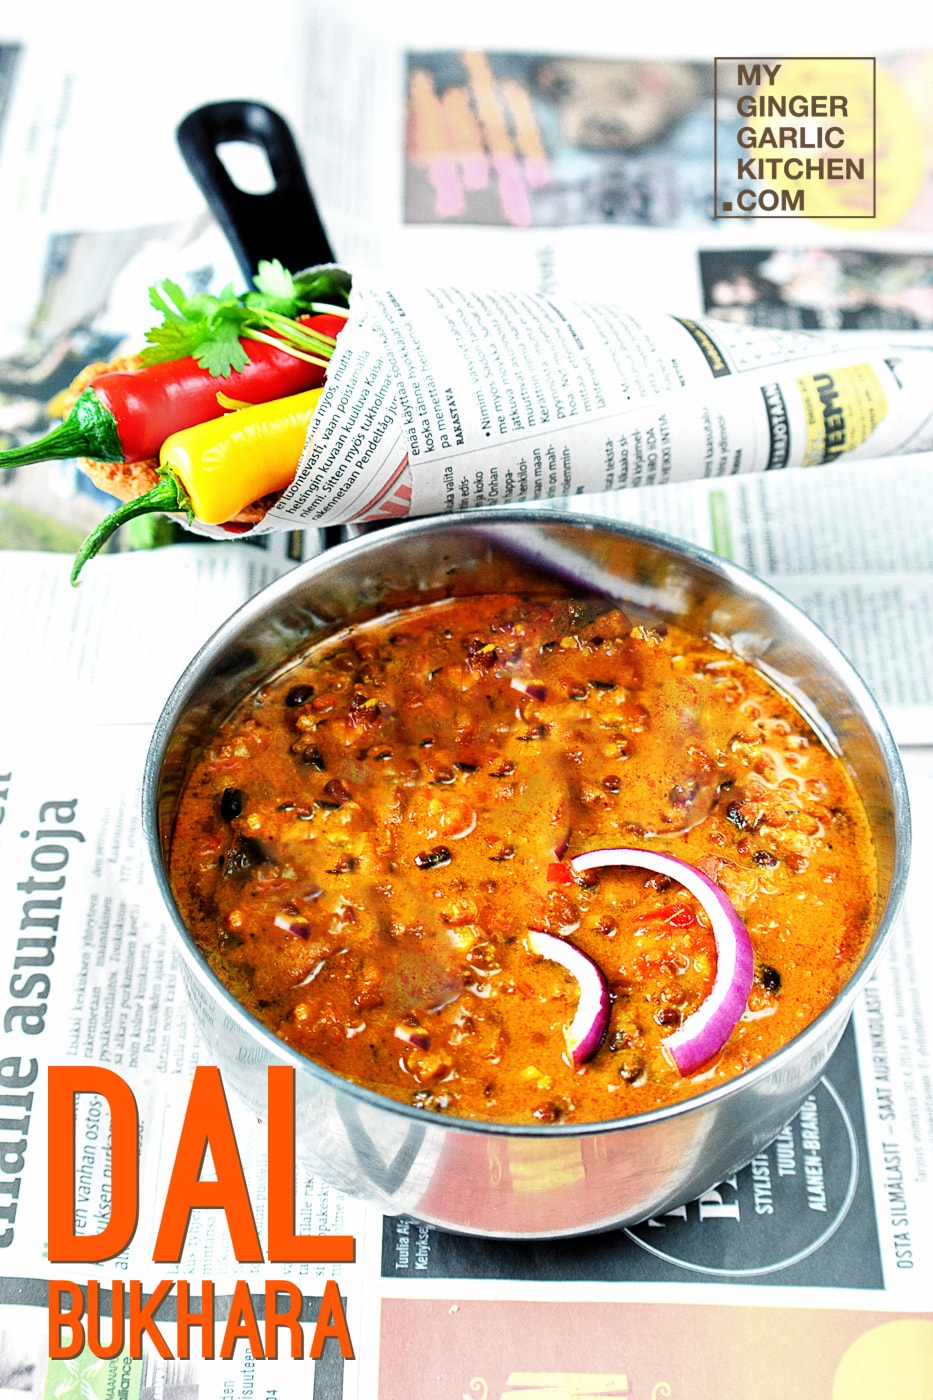 Recipe dal bukhara an exotic creamy black lentil dish my ginger recipe dal bukhara an exotic creamy black lentil dish forumfinder Choice Image